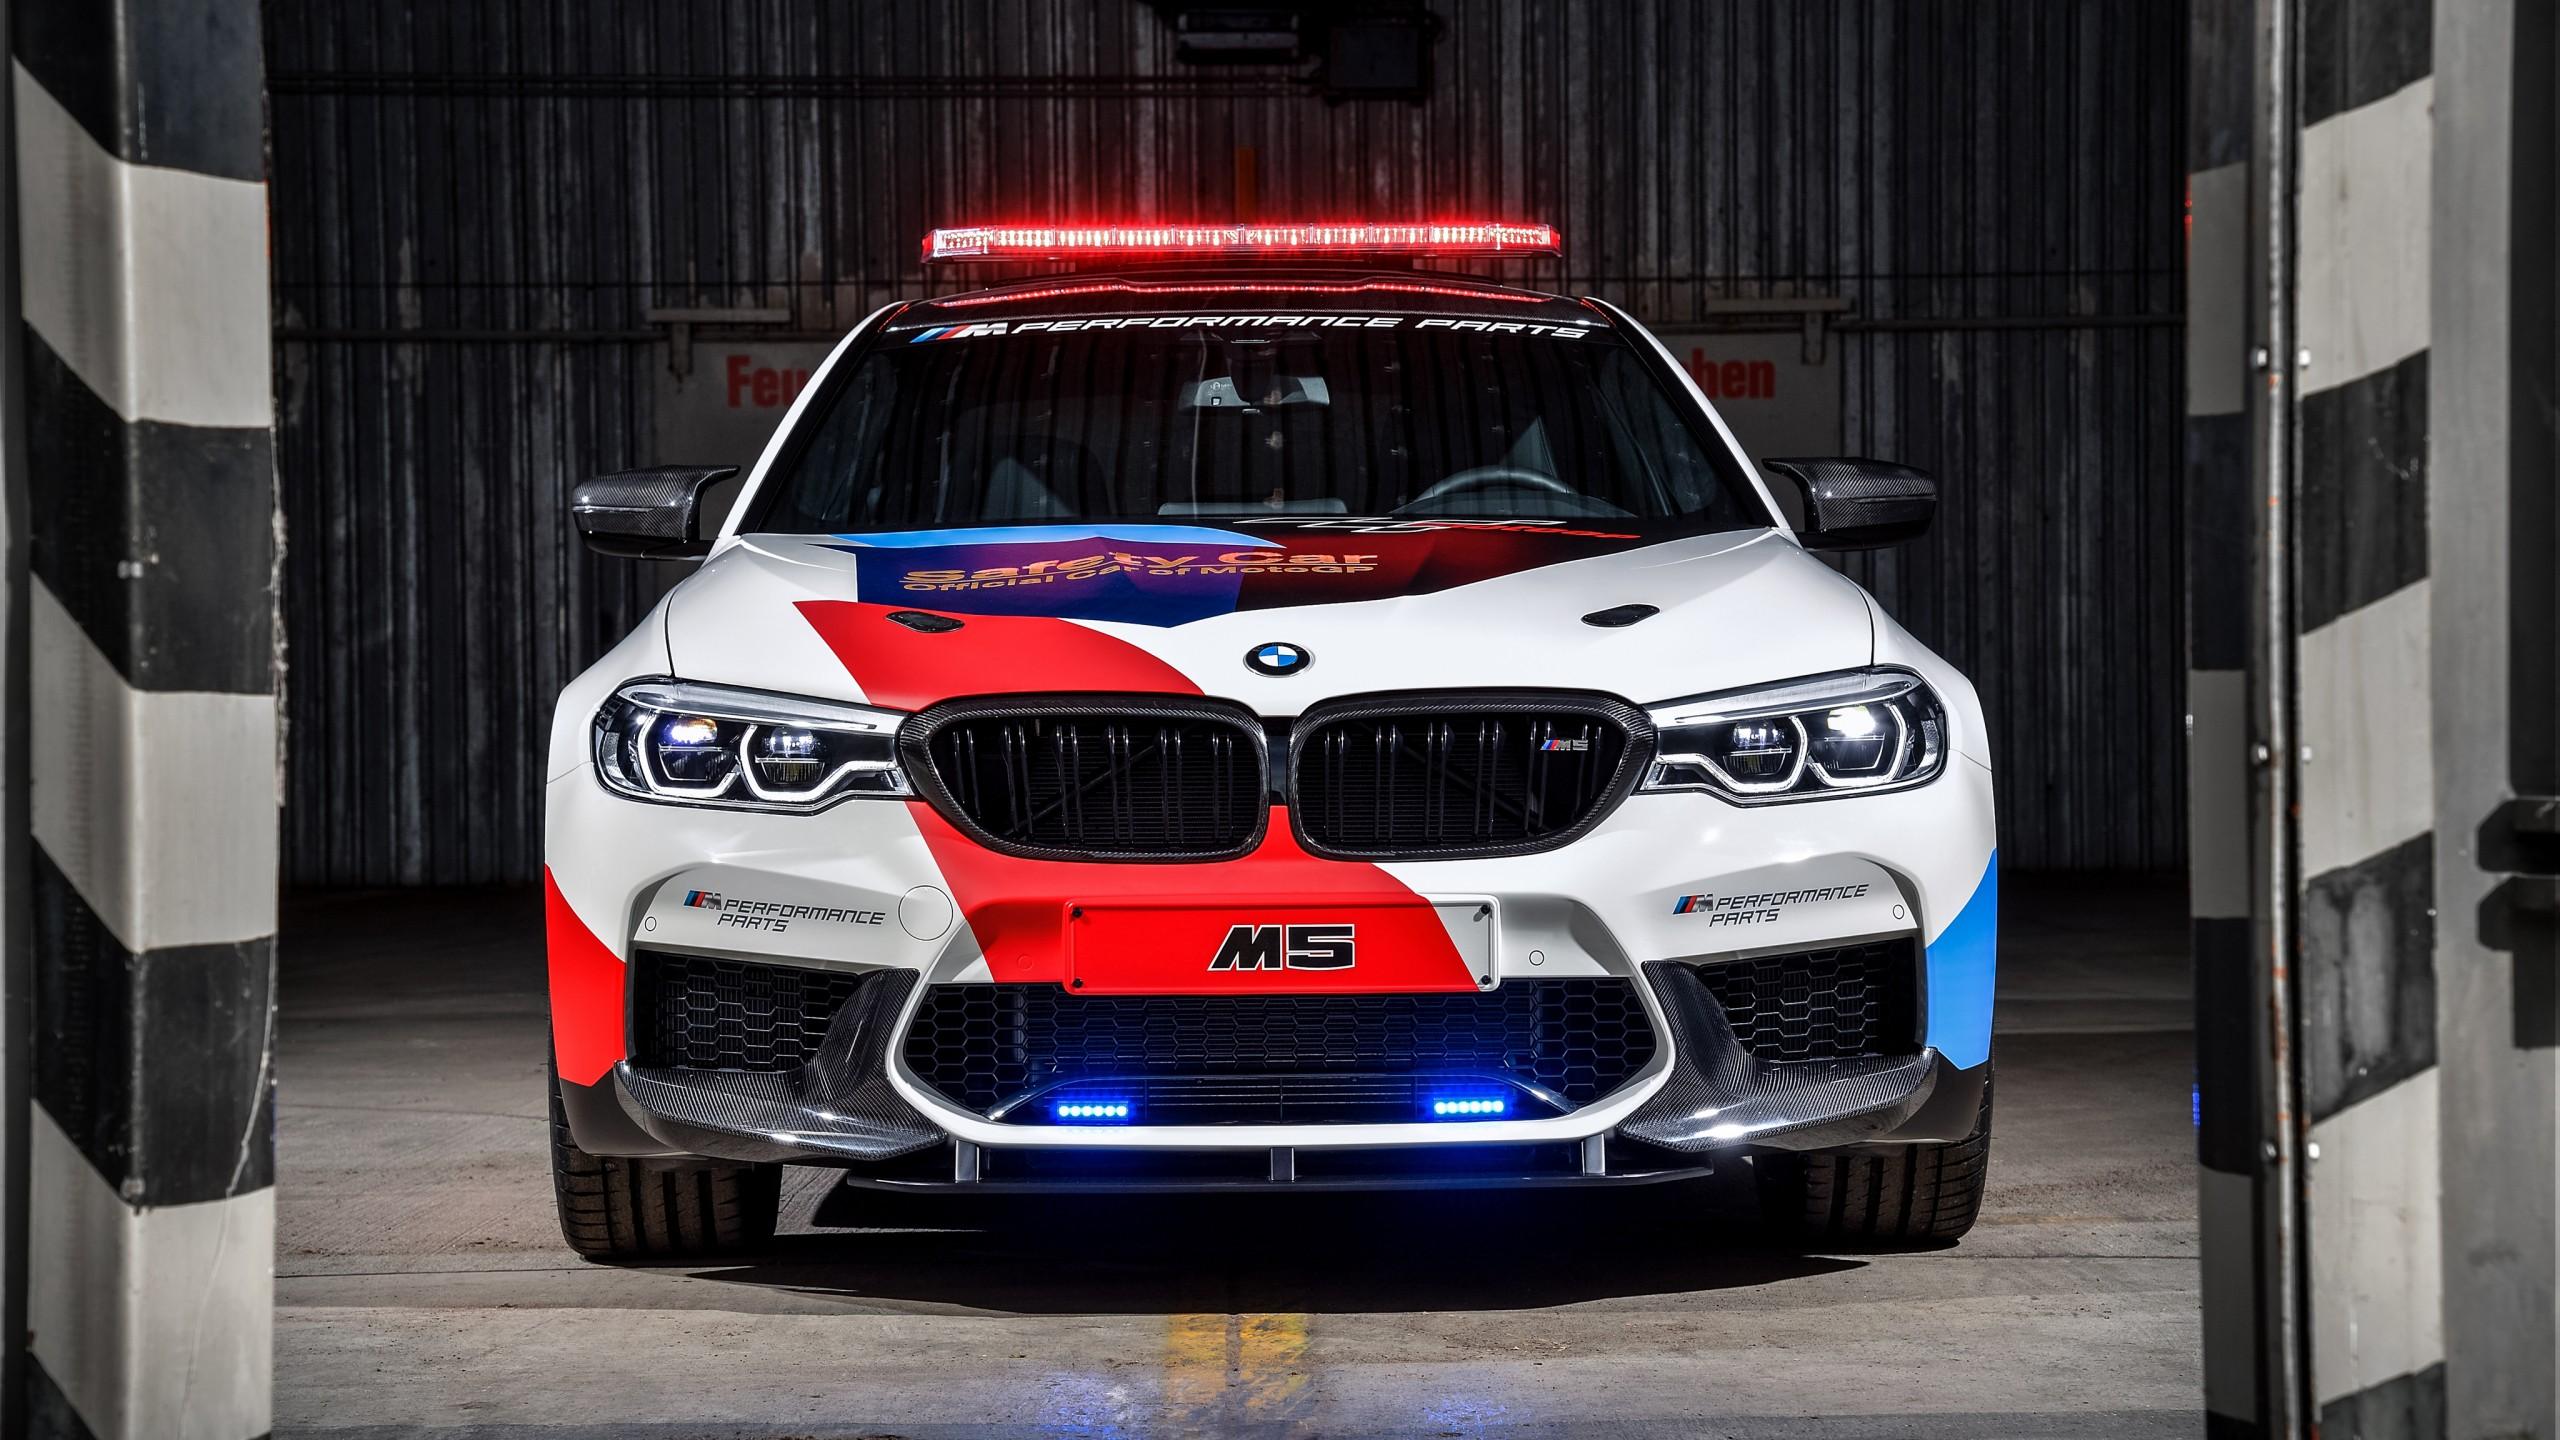 2018 BMW M5 MotoGP Safety Car 4K Wallpaper | HD Car ...